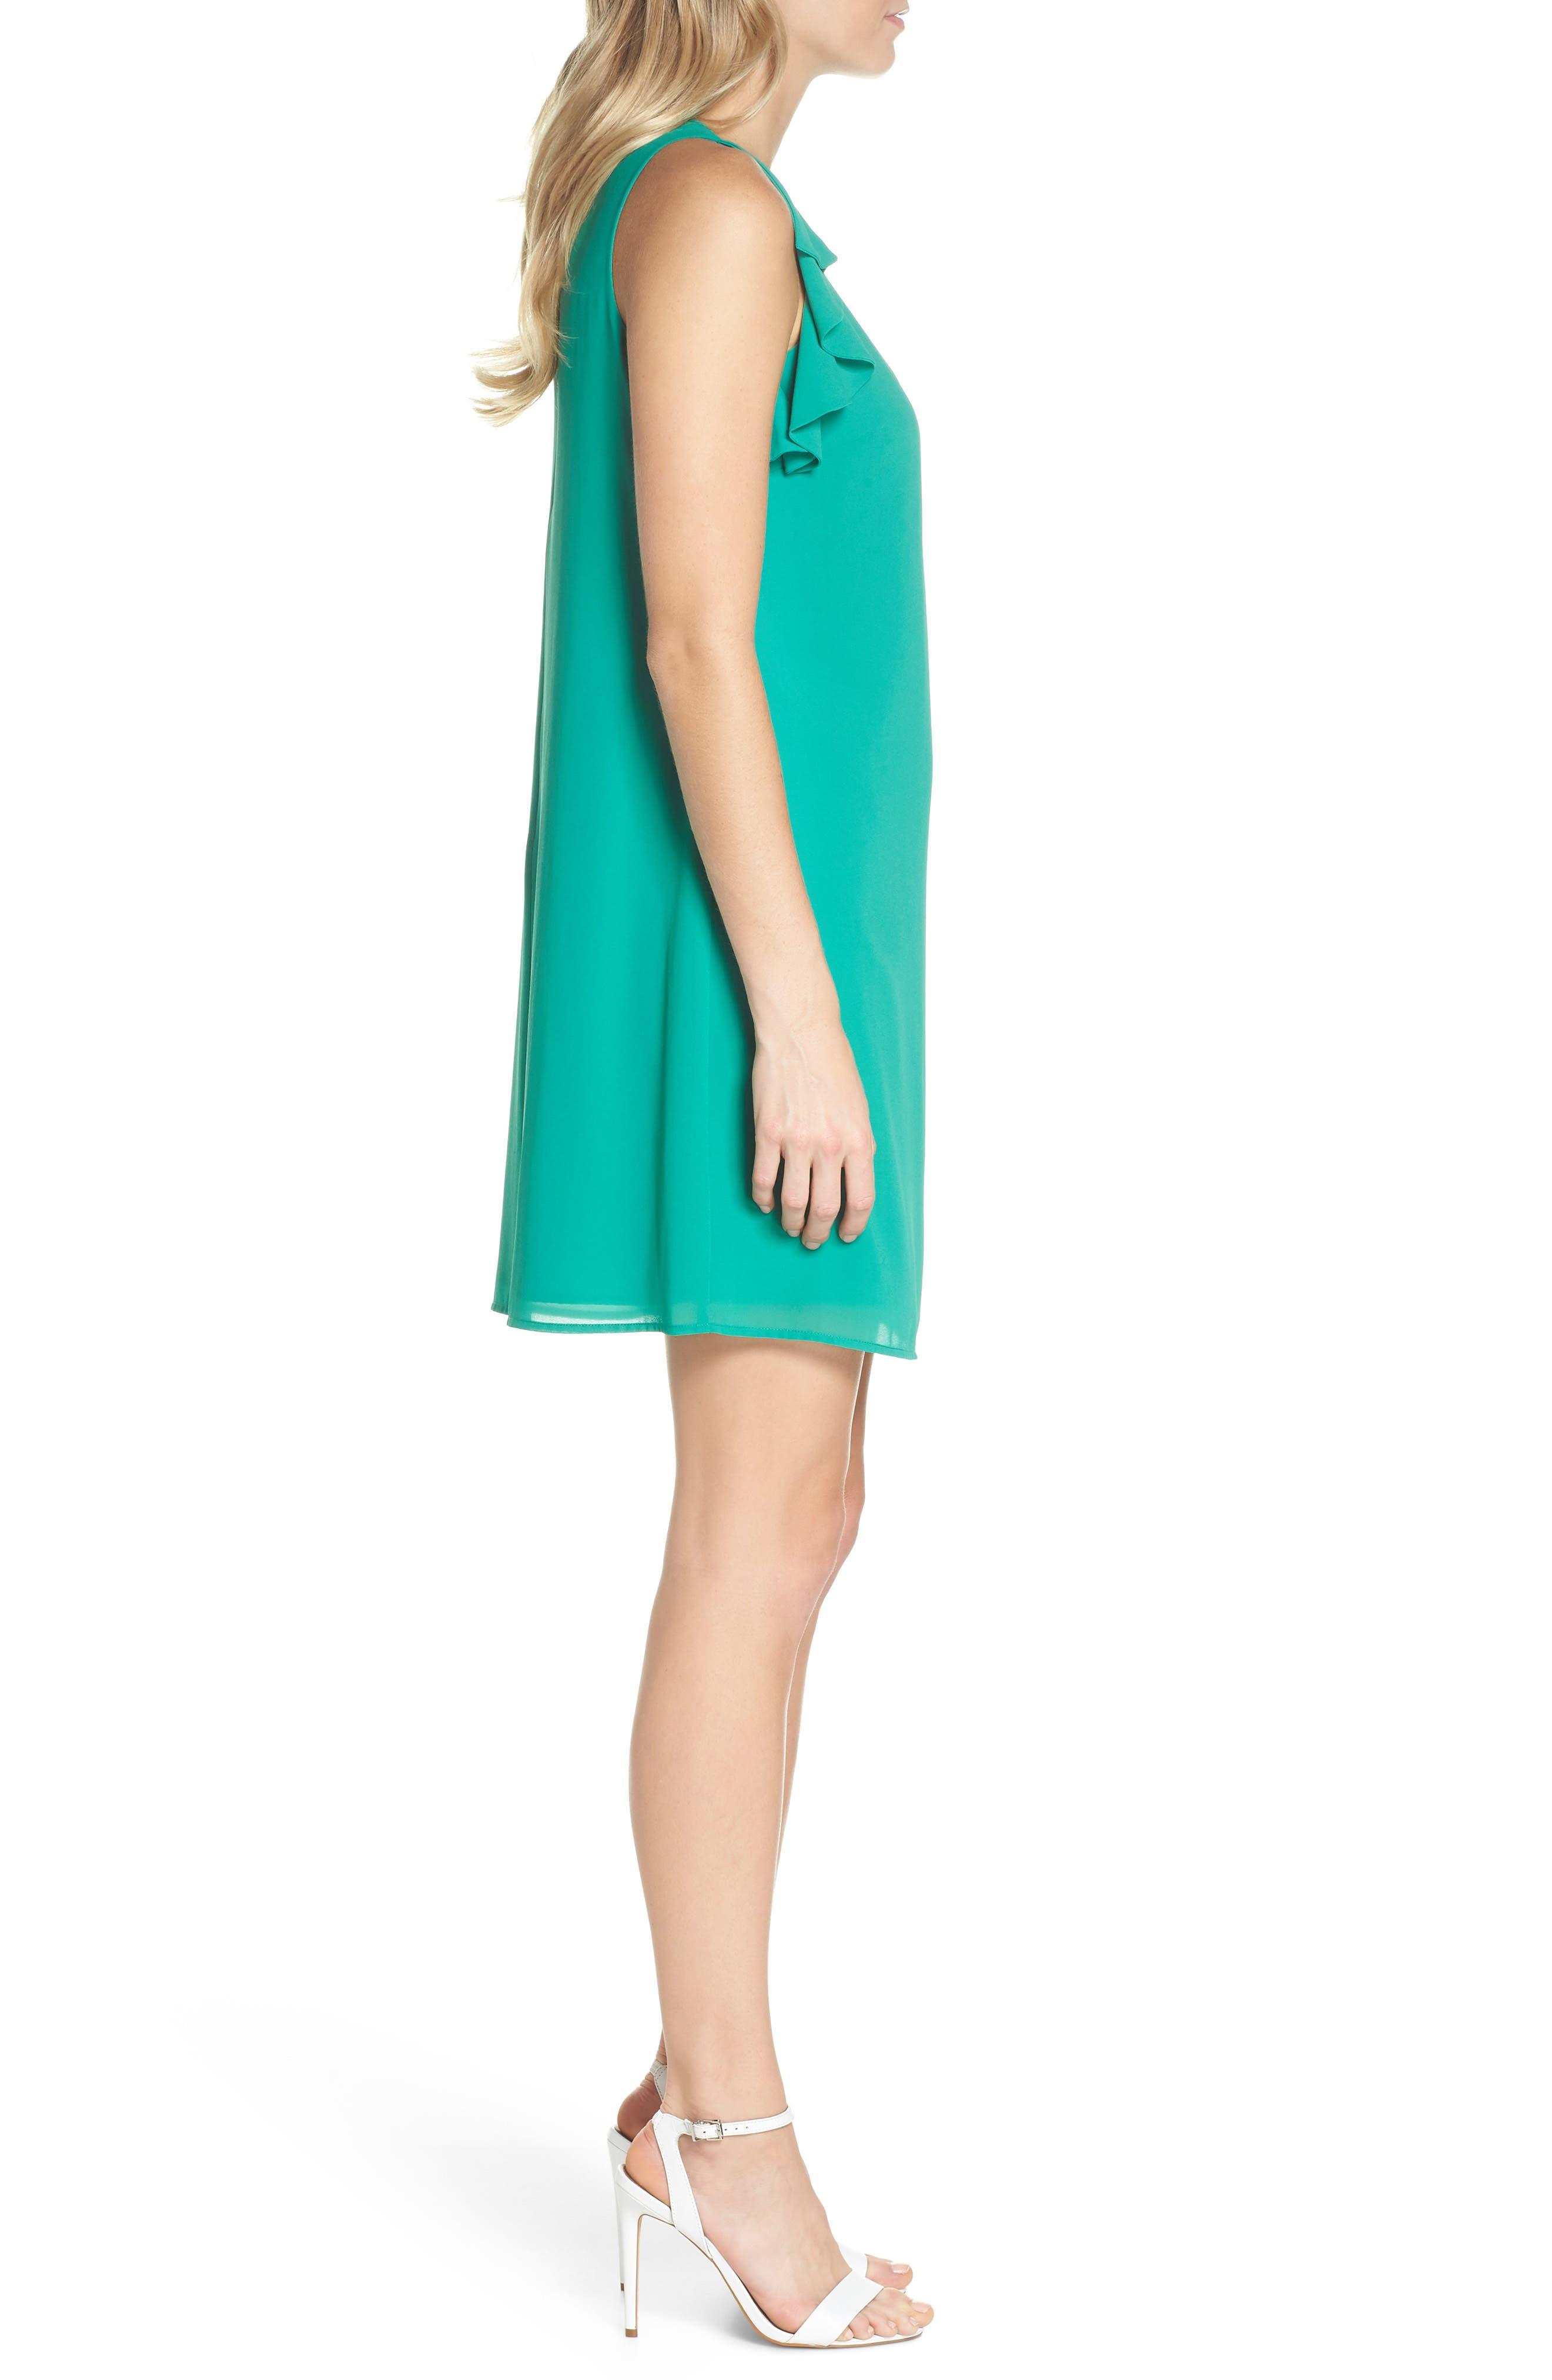 Soufflé Ruffle Chiffon Shift Dress,                             Alternate thumbnail 3, color,                             Green